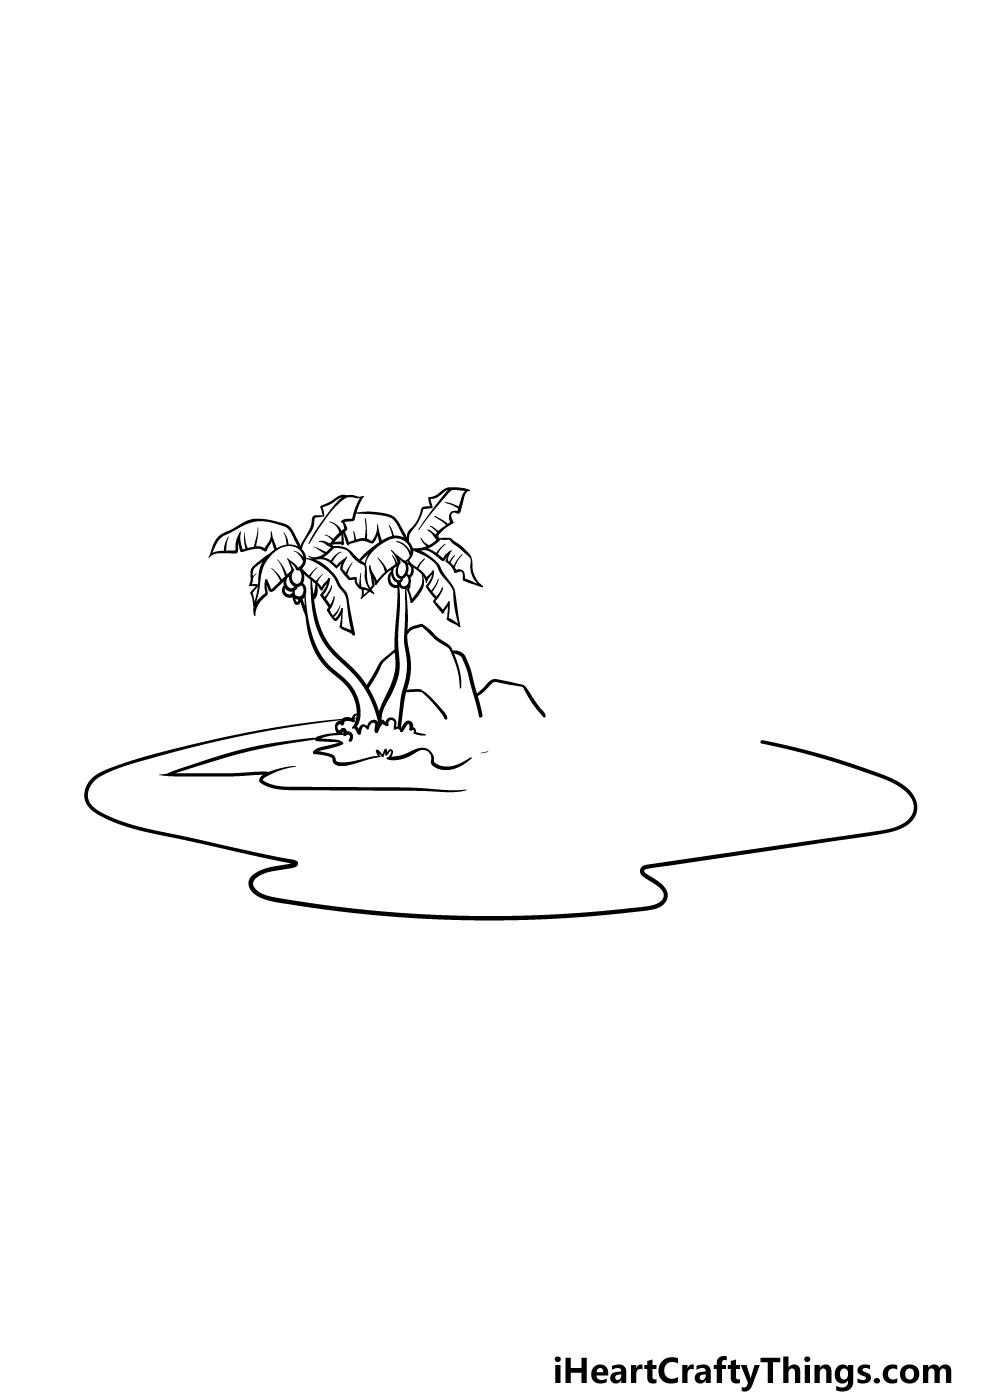 drawing an island step 3